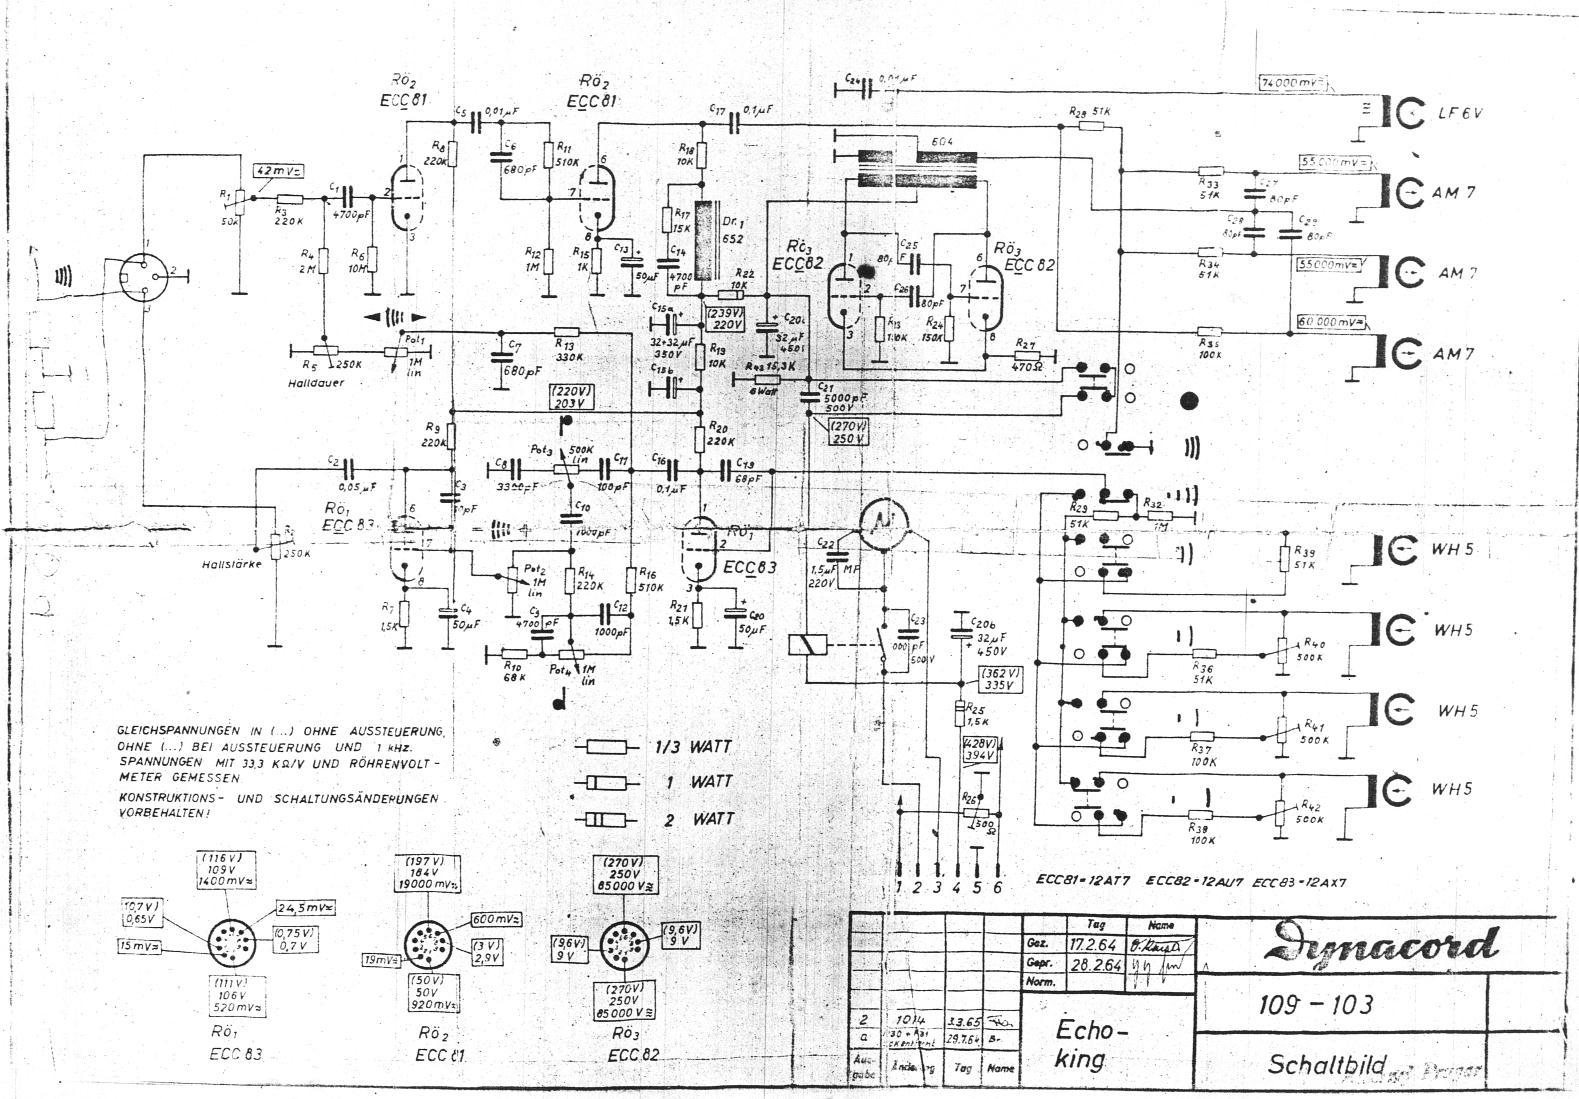 Dynacord Bass Amp Schematics Auto Electrical Wiring Diagram 15 Watt Amplifier Electronic Circuit Index Of Uploads Amplifiers Rh Tvr Vejas Lt Dumble 6au6 Guitar Schematic